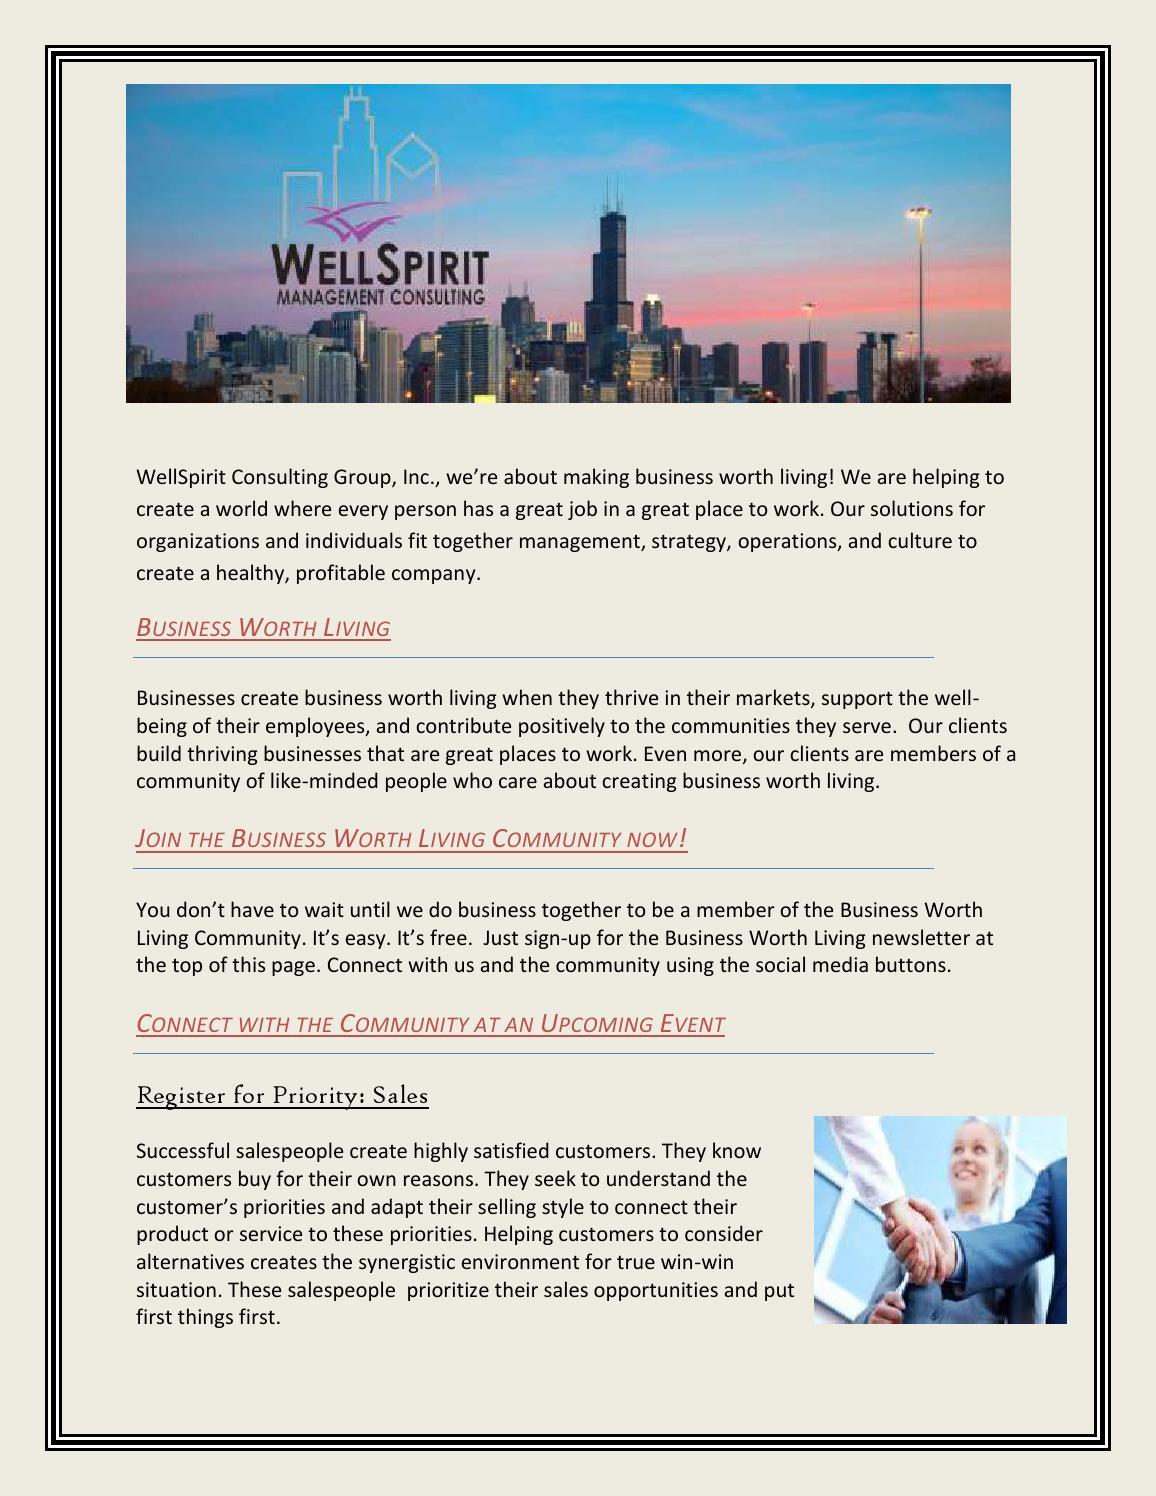 Business Worth Living By Wellspiritconsulting Issuu